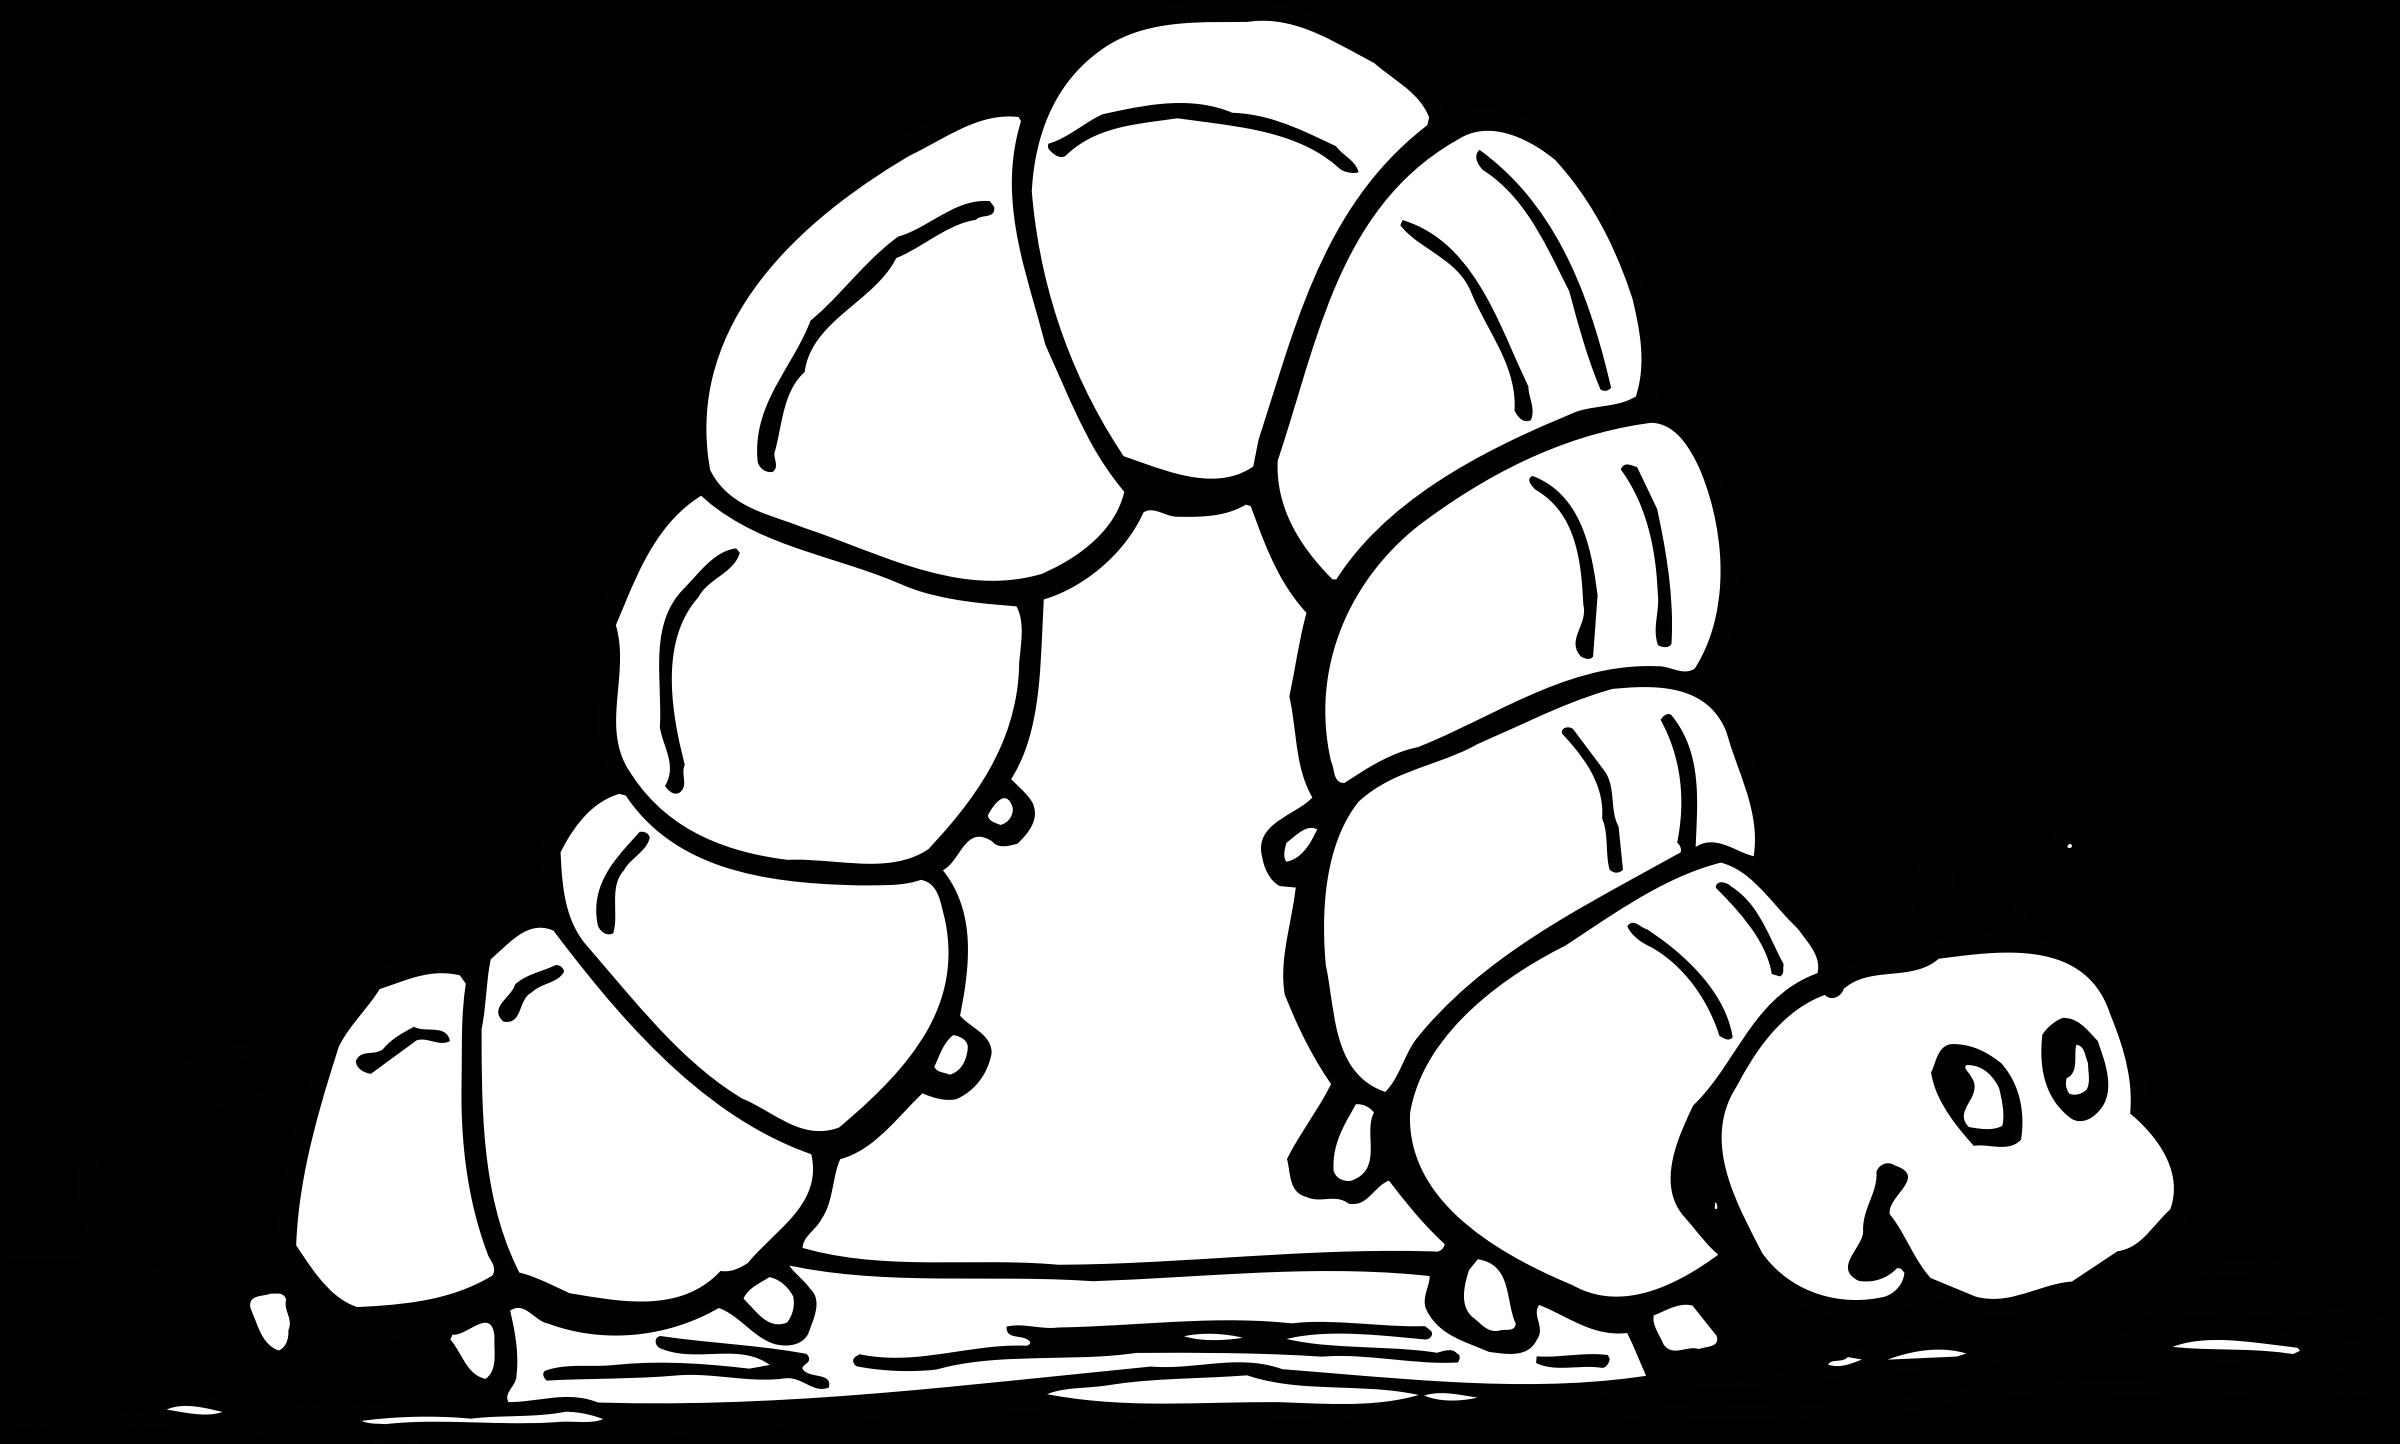 Inchworm clipart Inchworm Clipart Inchworm